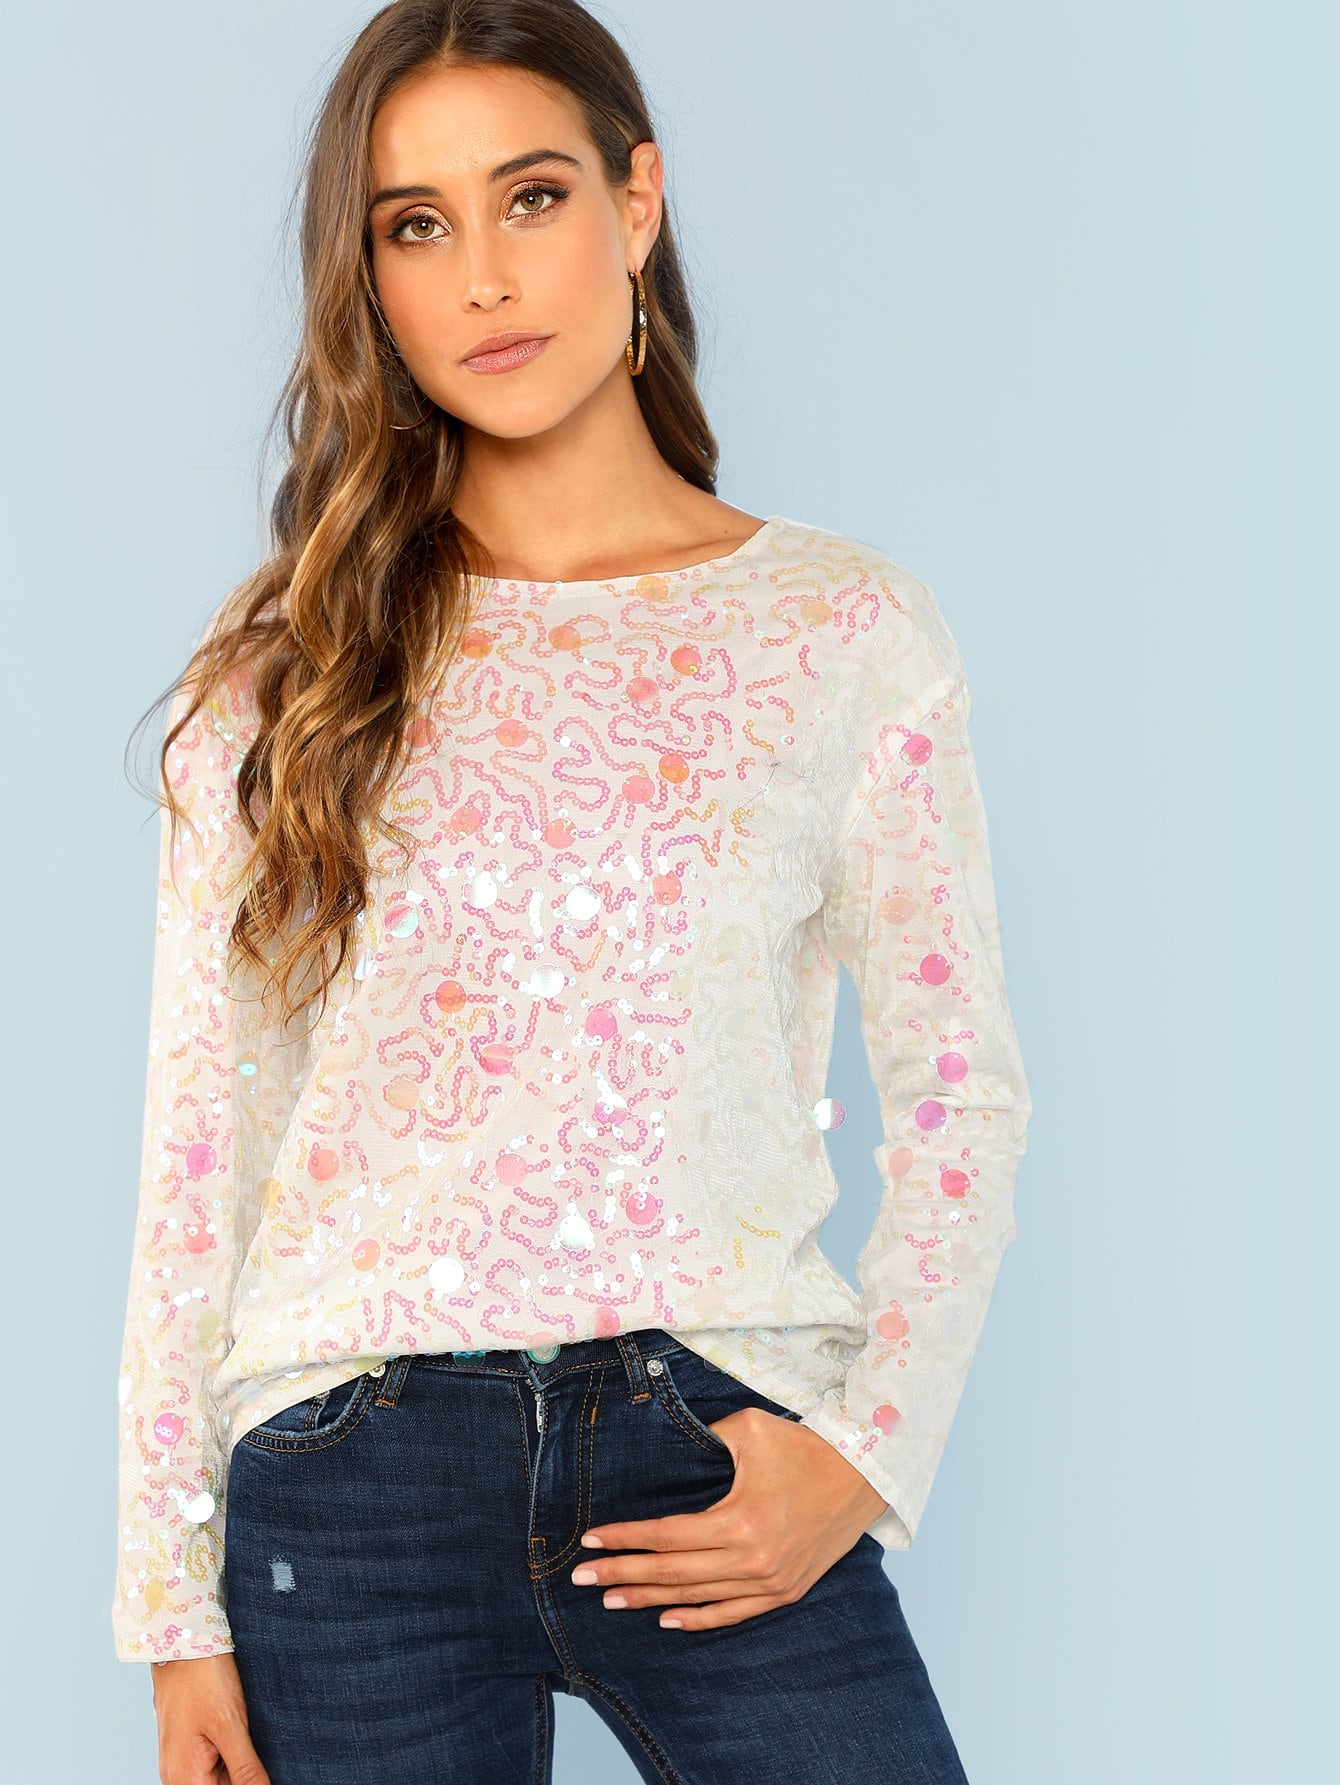 Купить Прозрачная блузка с блестками, Anna Herrin, SheIn